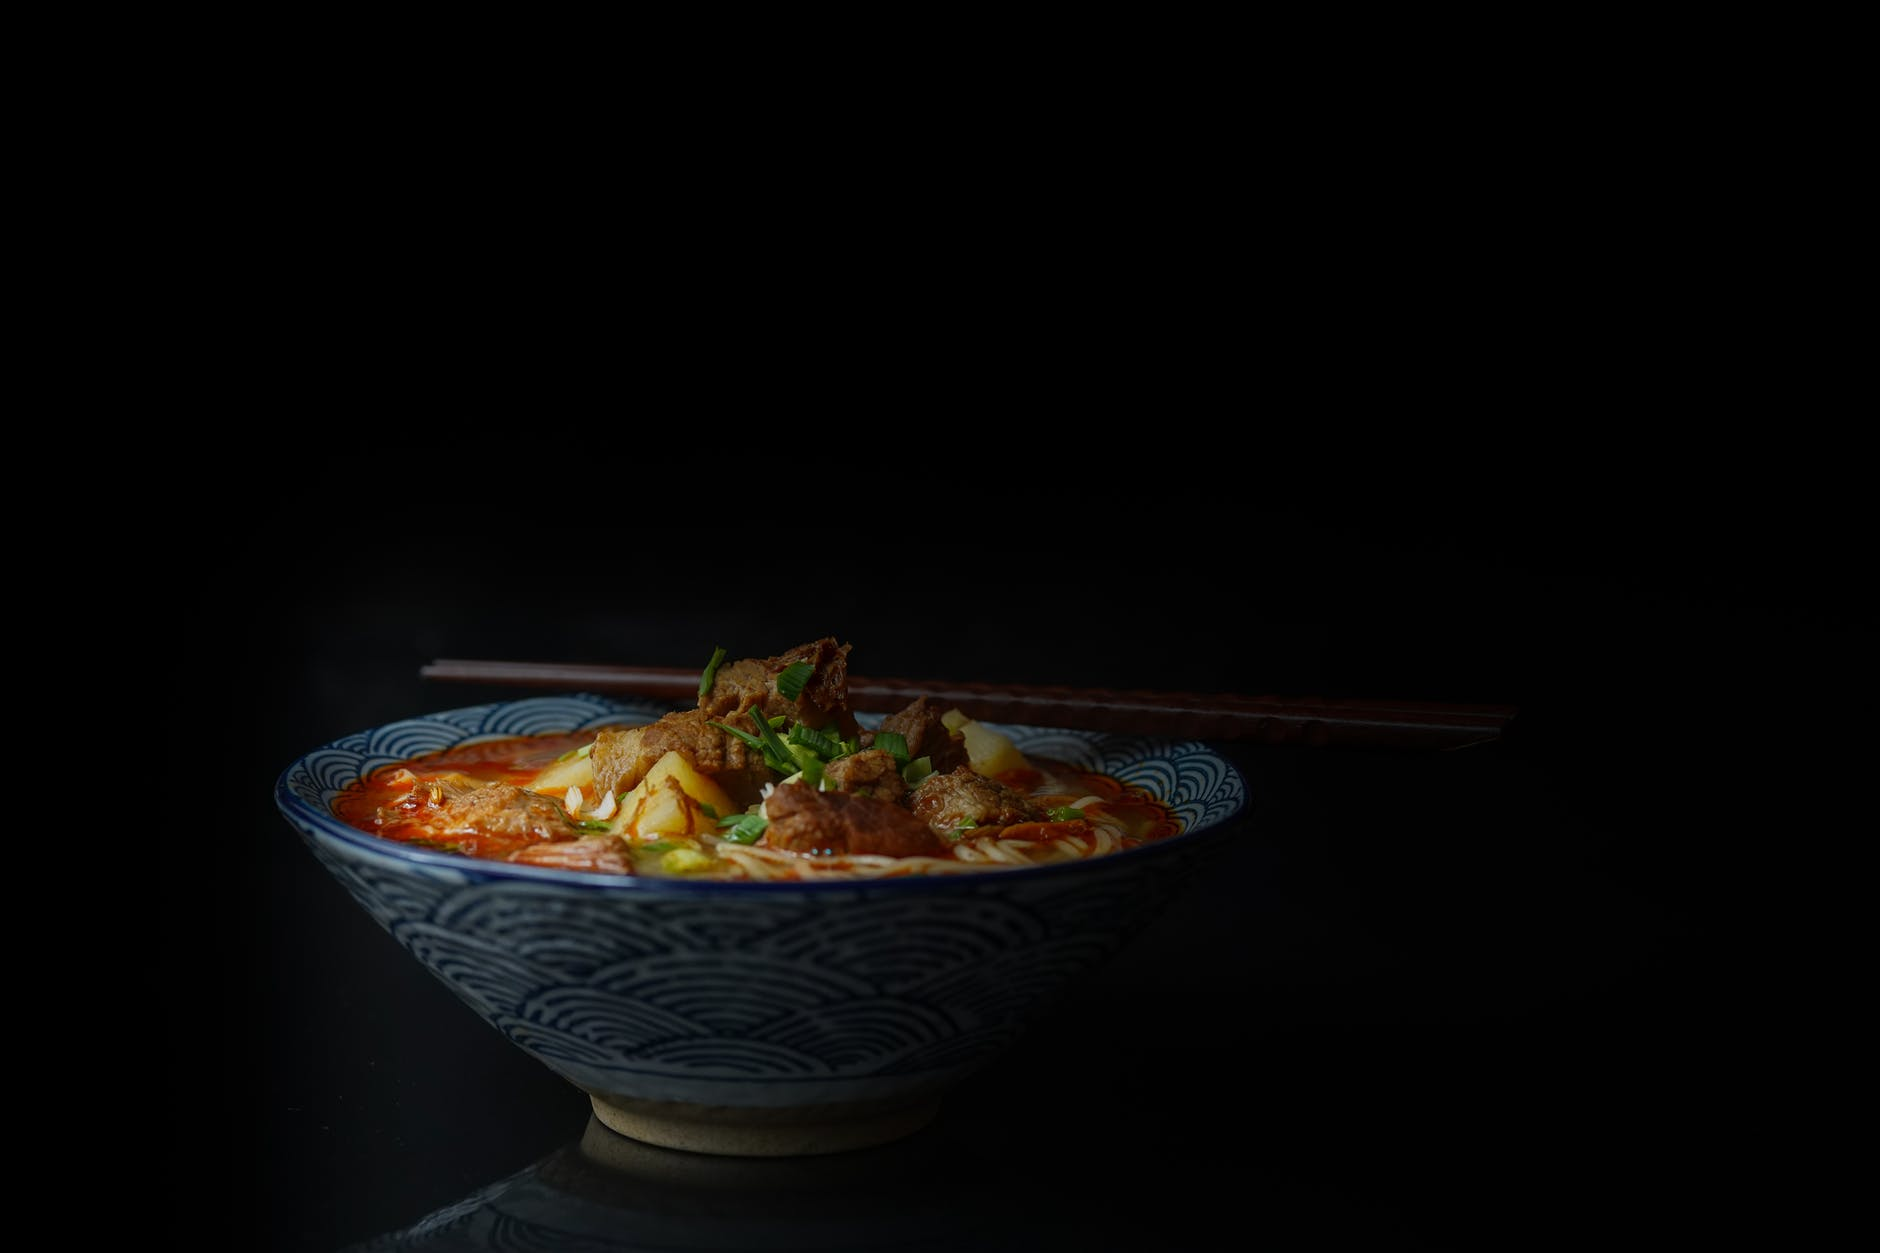 soup served on bowl